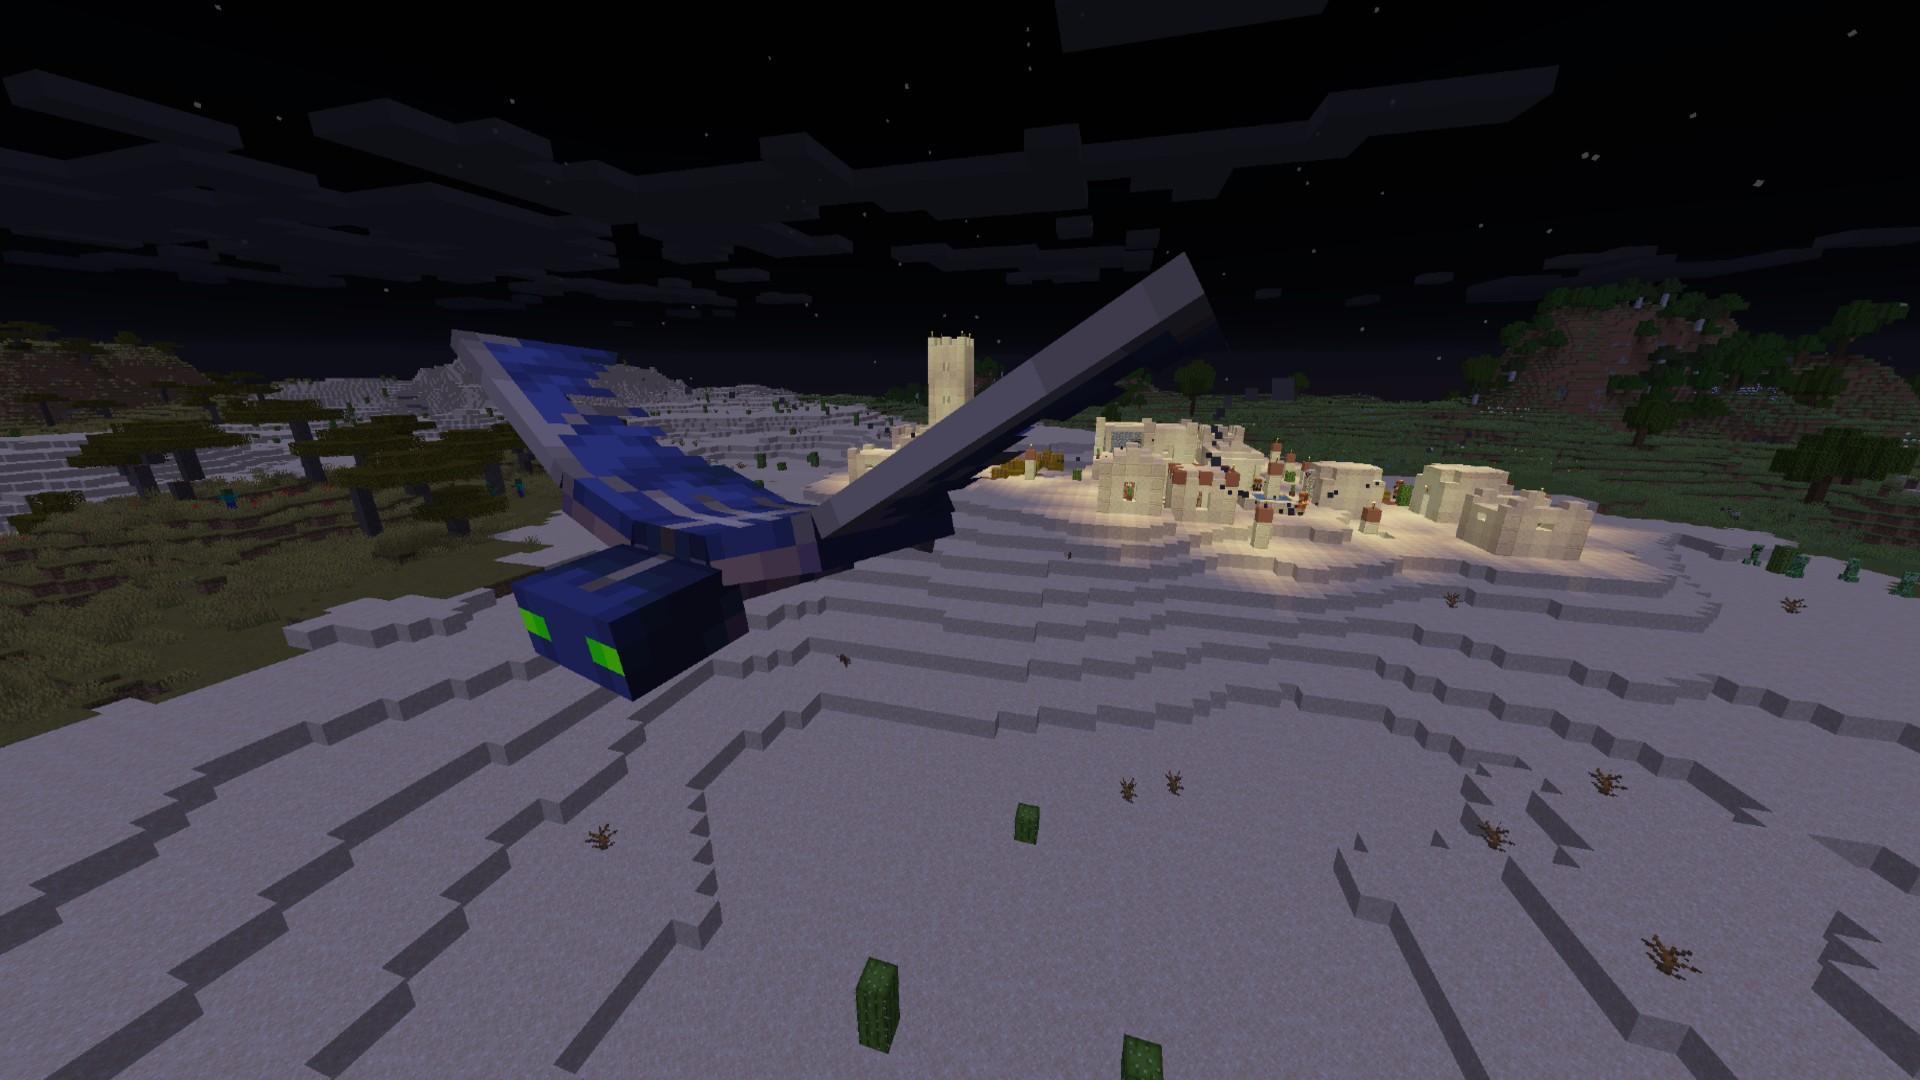 Minecraft phantom: summoning, spawning, and looting guide